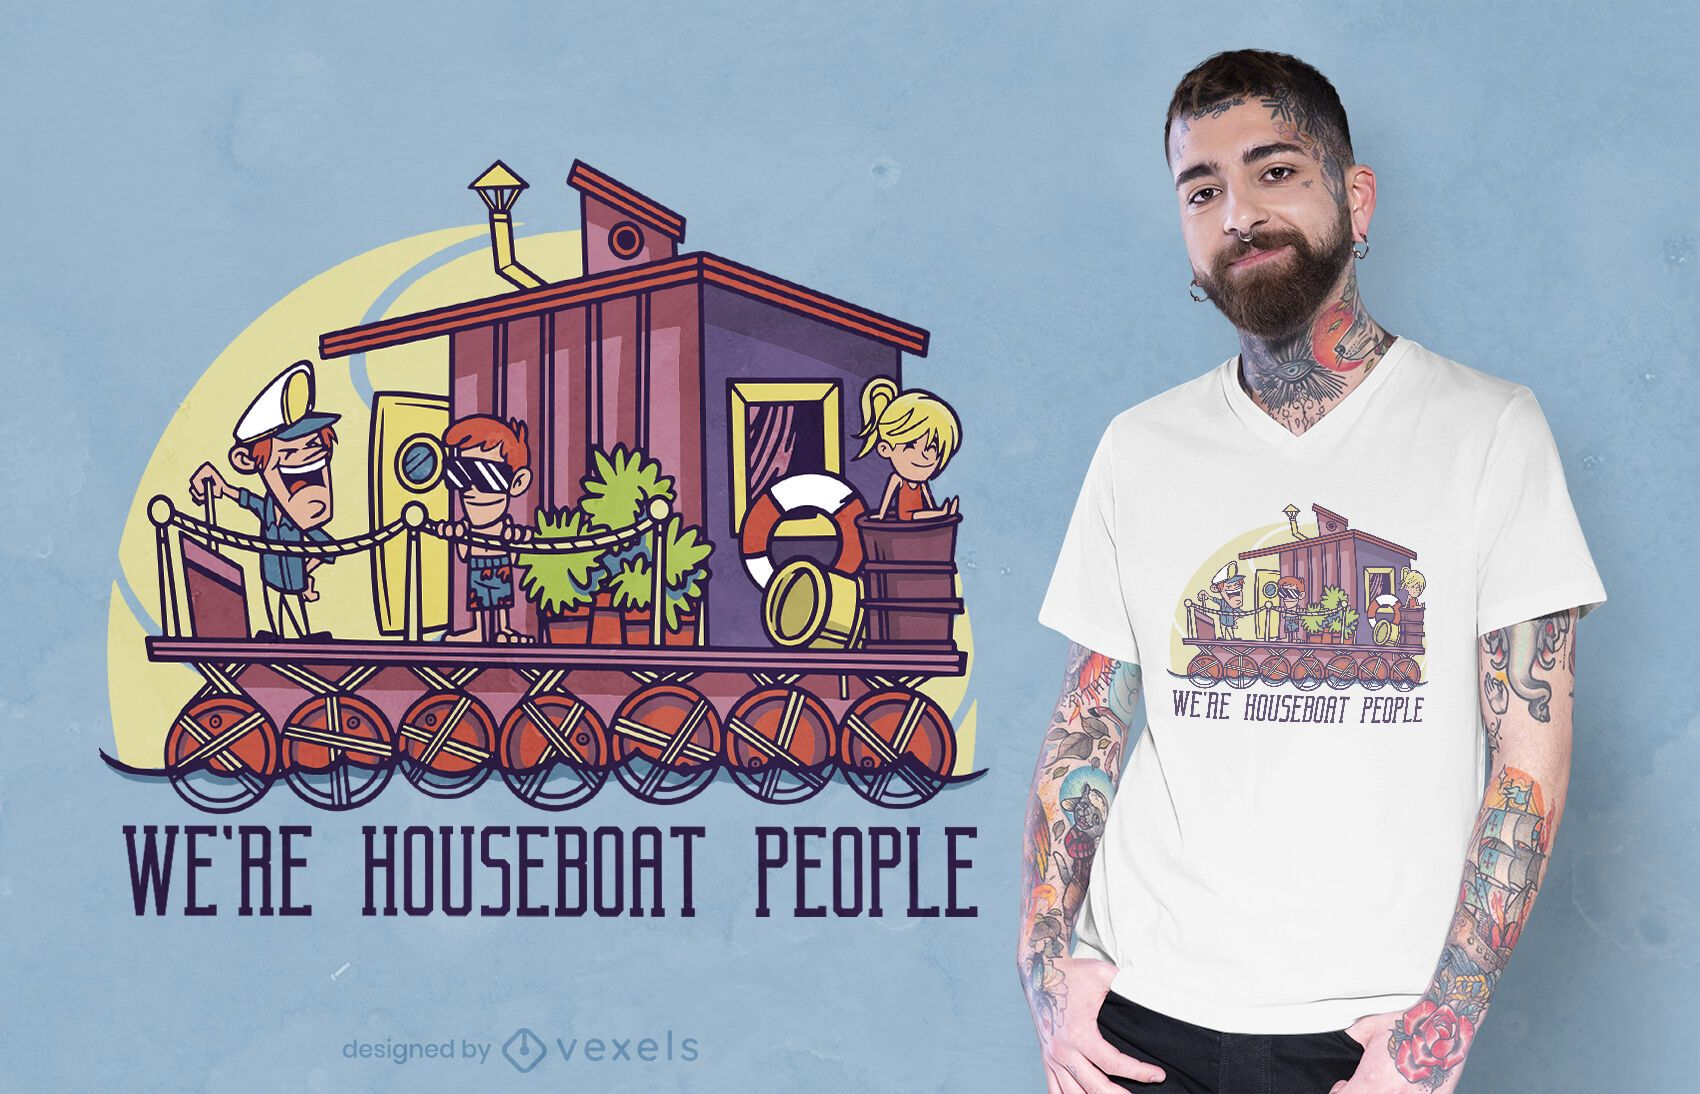 Dise?o de camiseta de personas casa flotante.